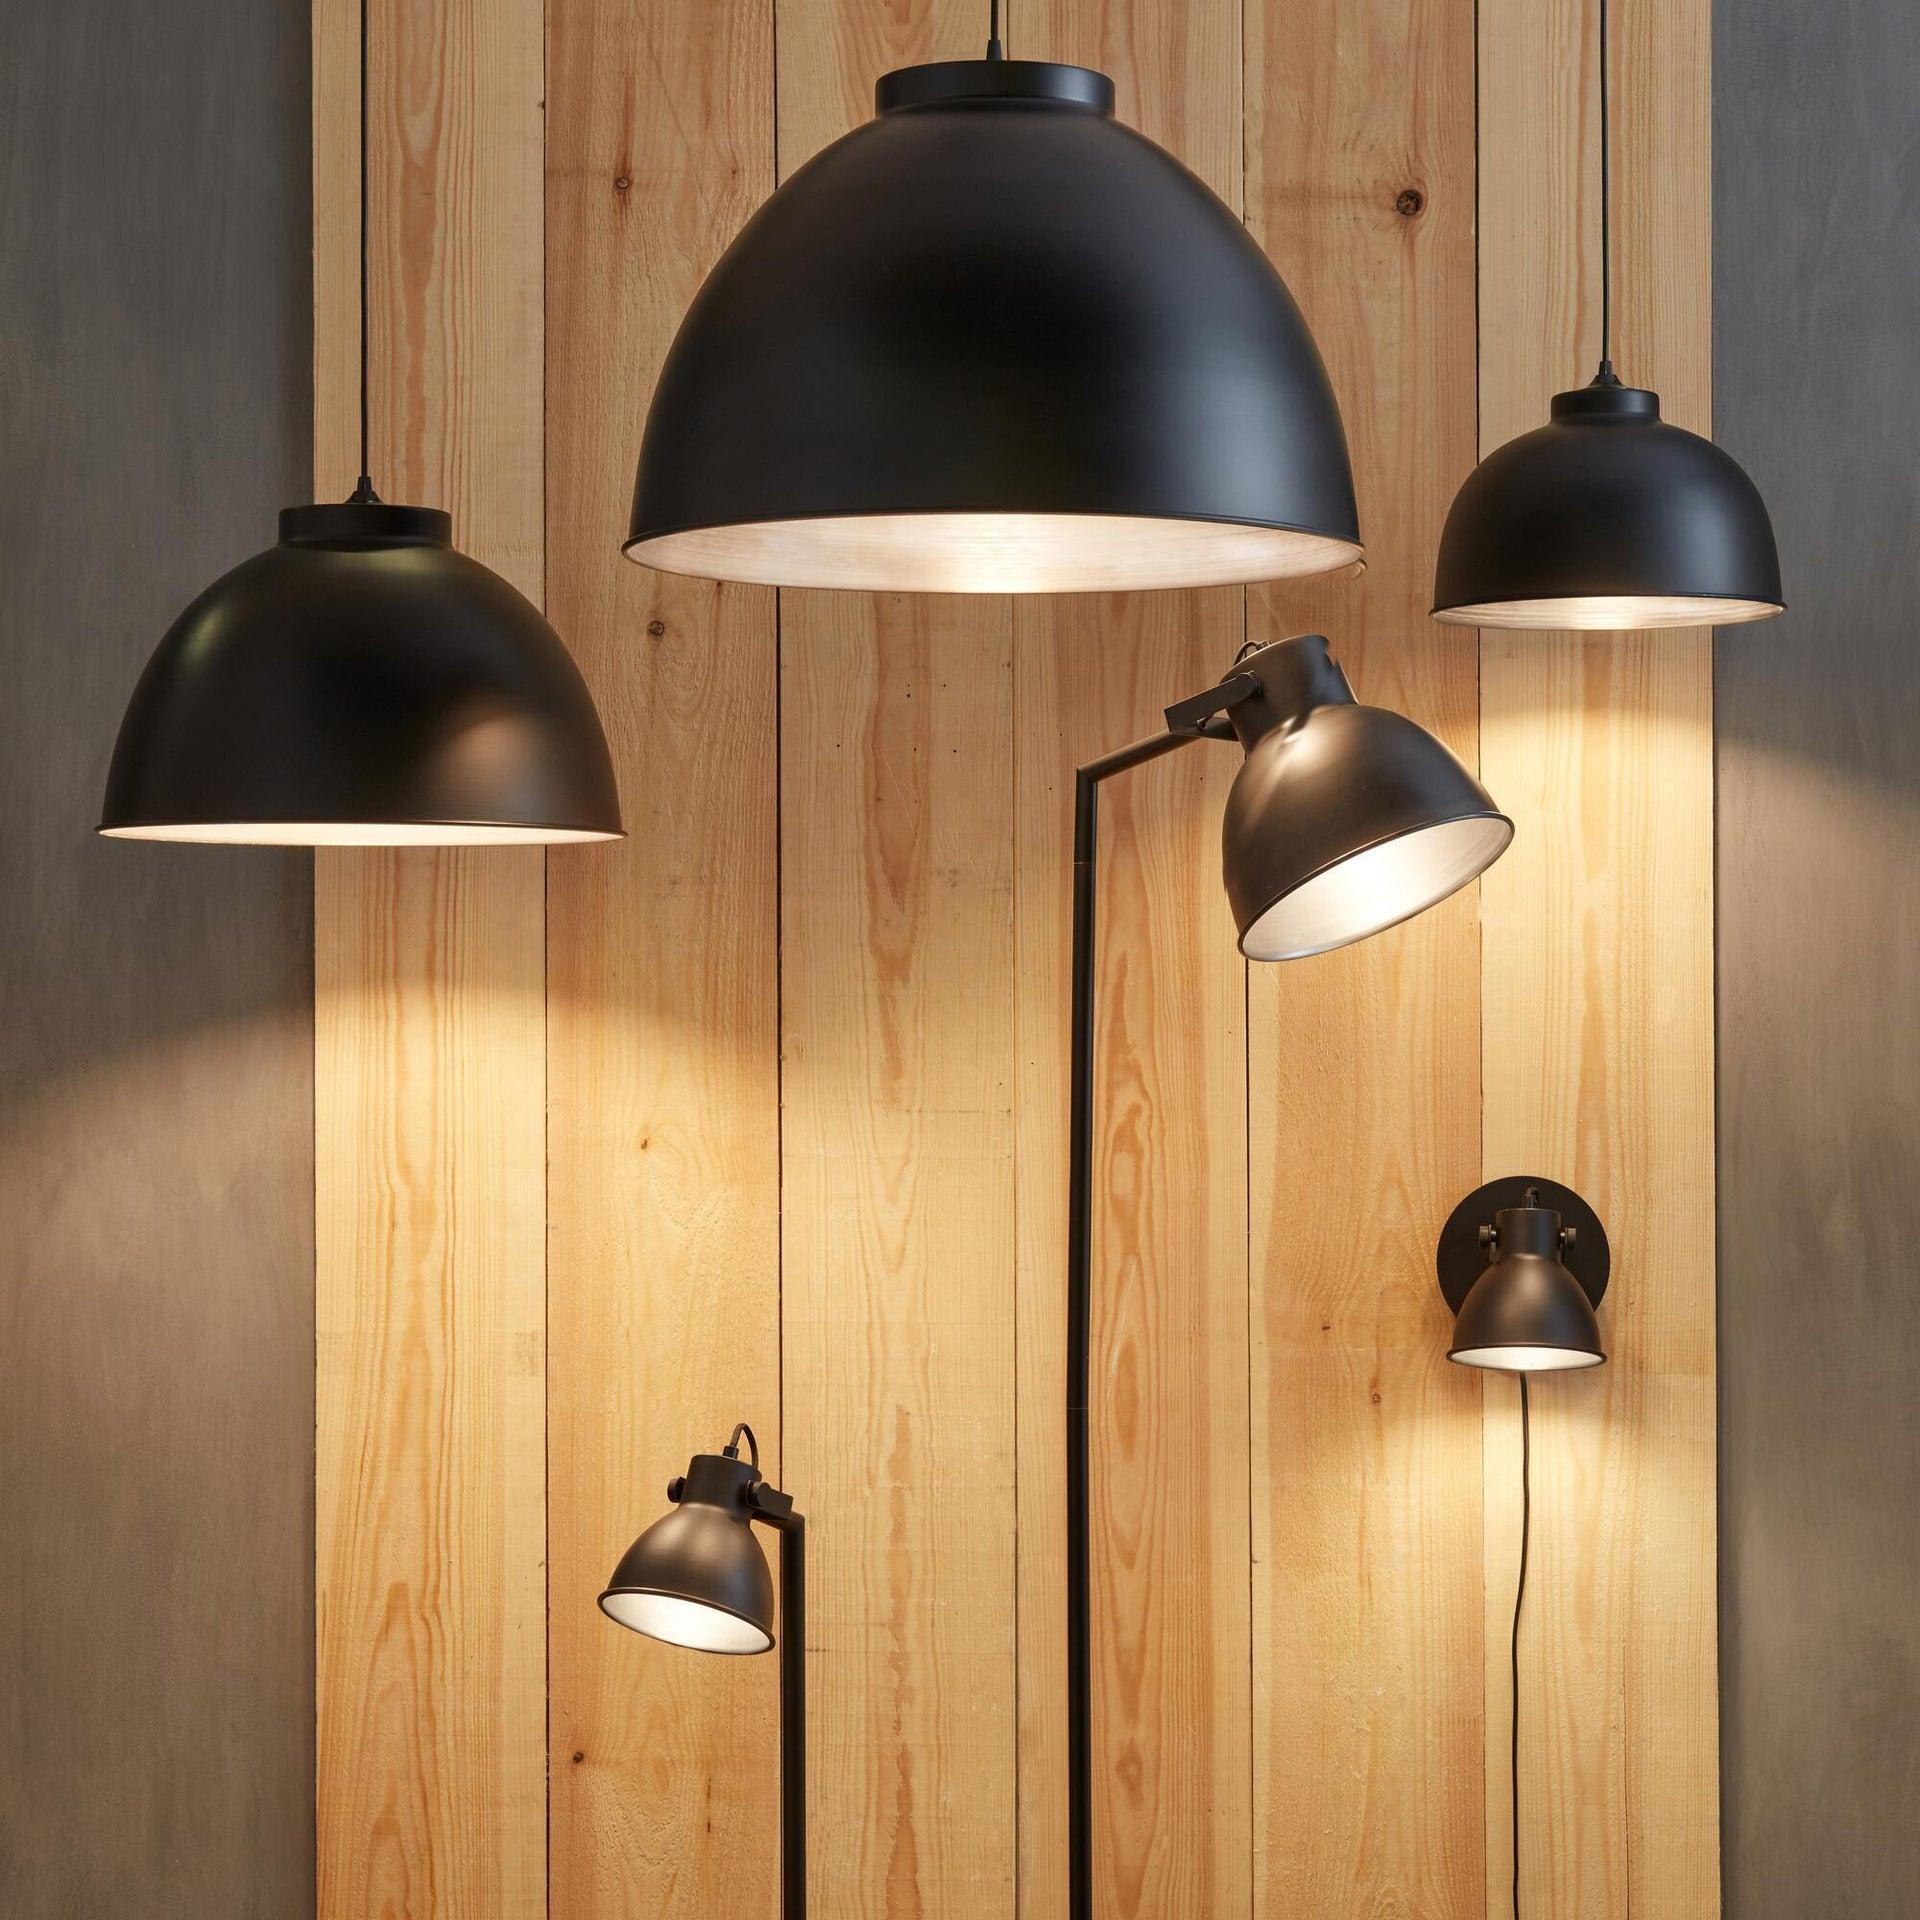 Lampadario Industriale Mezzo nero in metallo, D. 45 cm, INSPIRE - 1